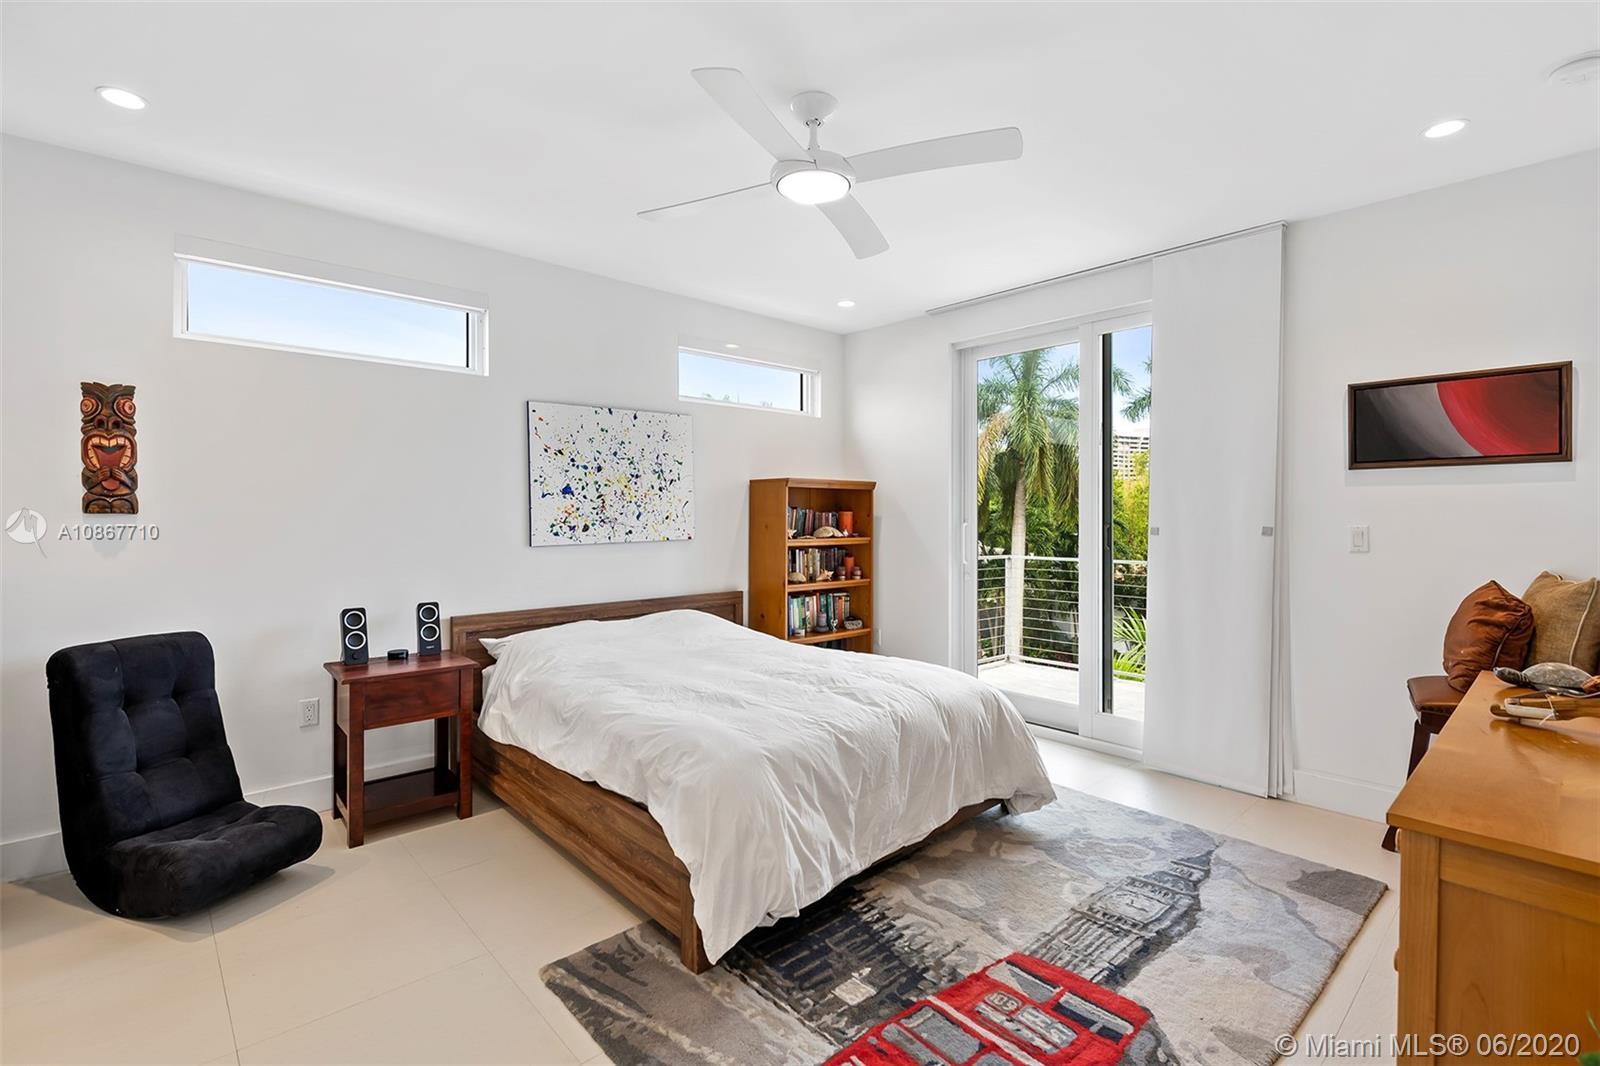 1835 Fairhaven Pl, Miami, Florida 33133, 4 Bedrooms Bedrooms, ,6 BathroomsBathrooms,Residential,For Sale,1835 Fairhaven Pl,A10867710